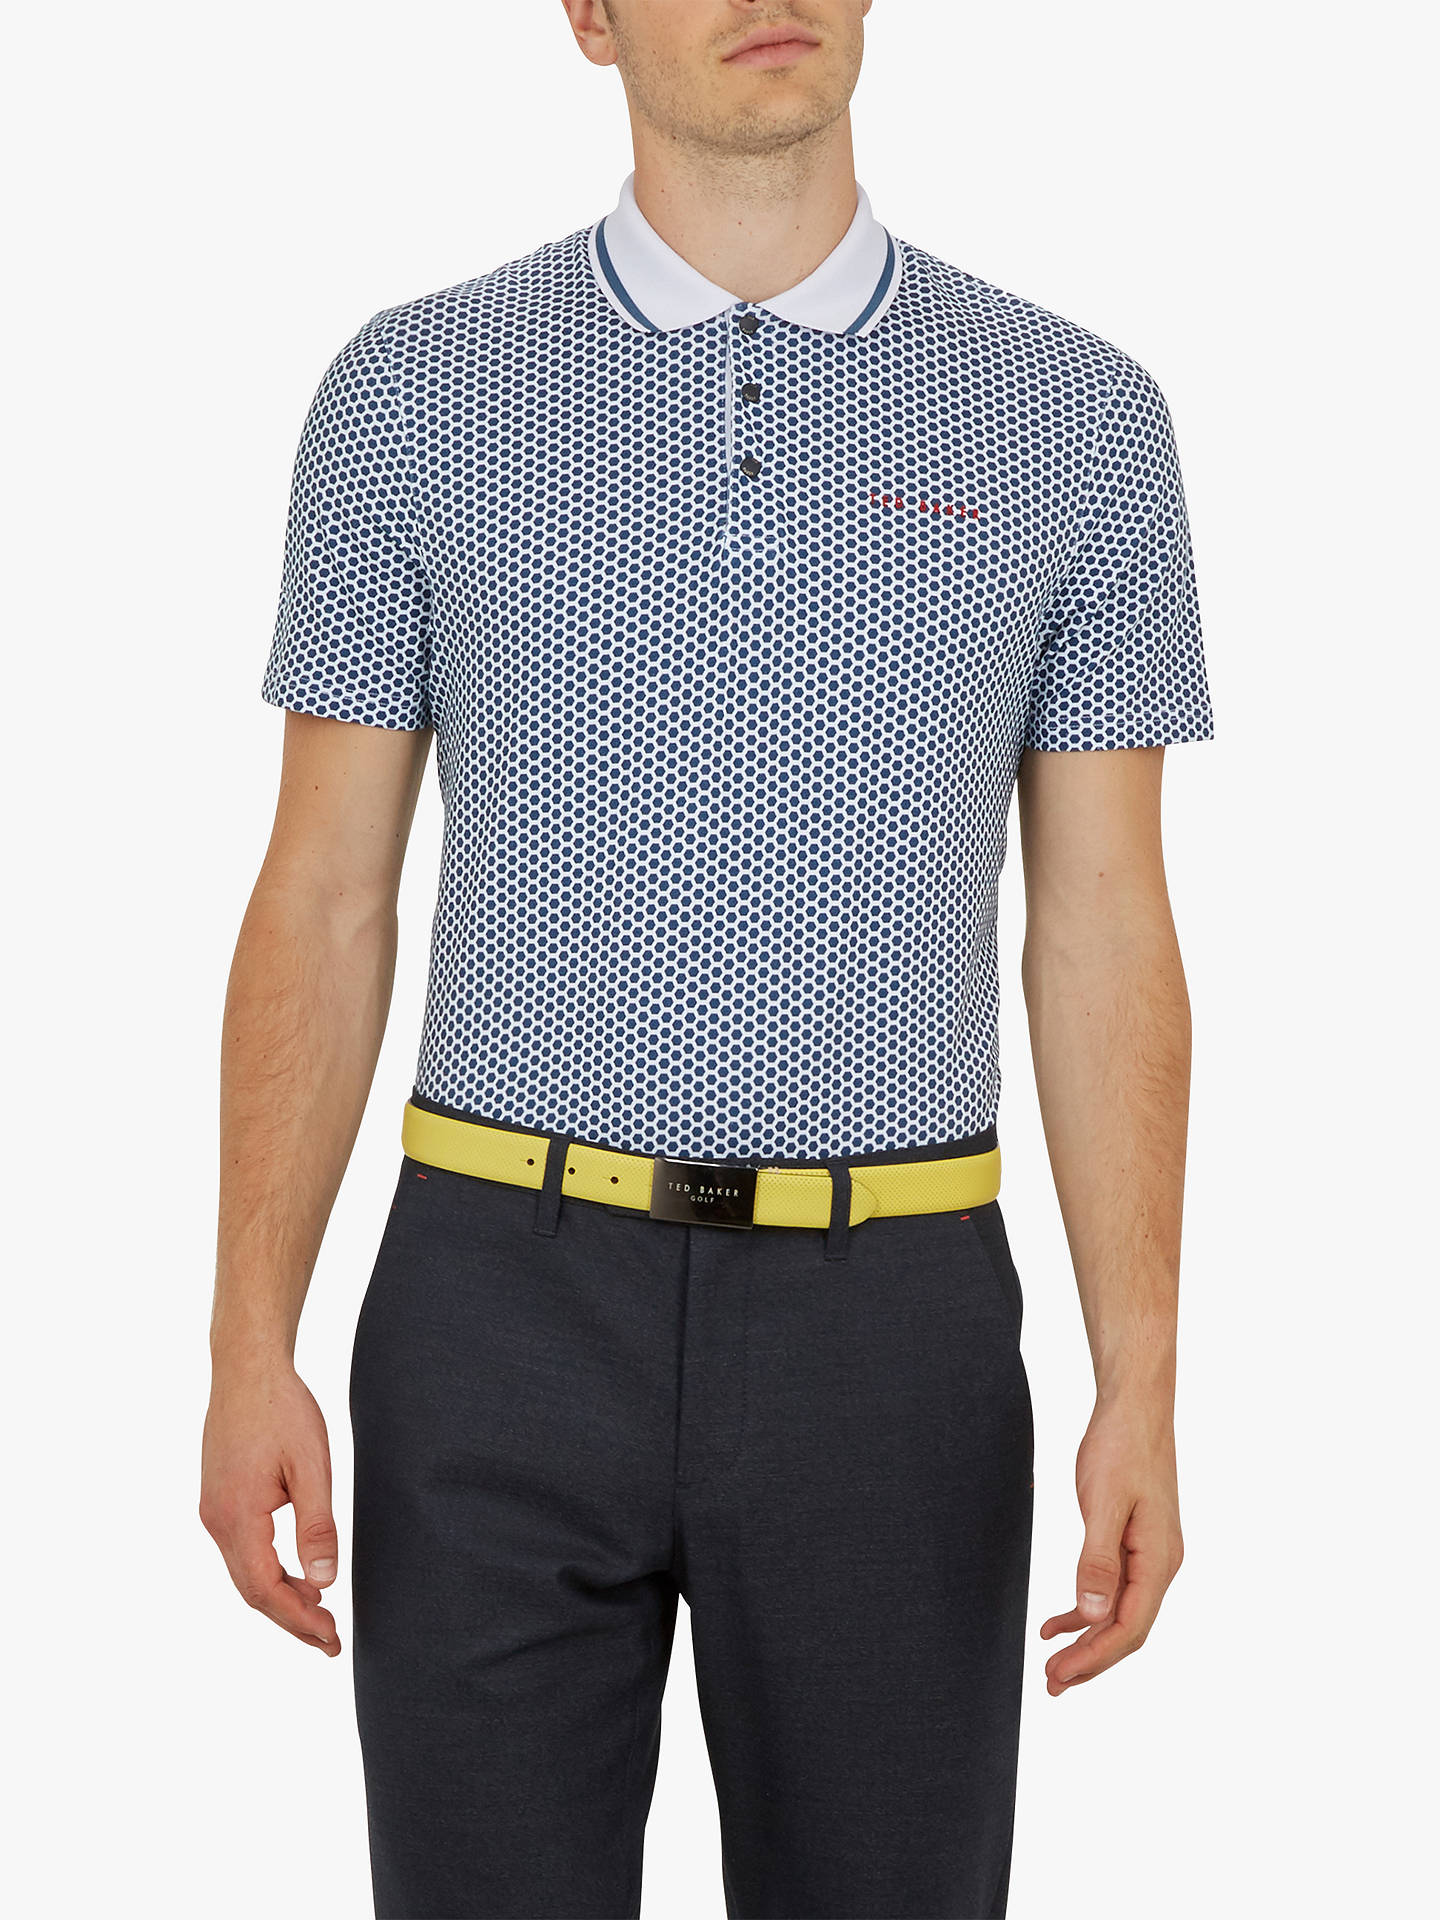 cac551095b769 Ted Baker Golf Erine Hexagon Geo Print Polo Shirt at John Lewis ...